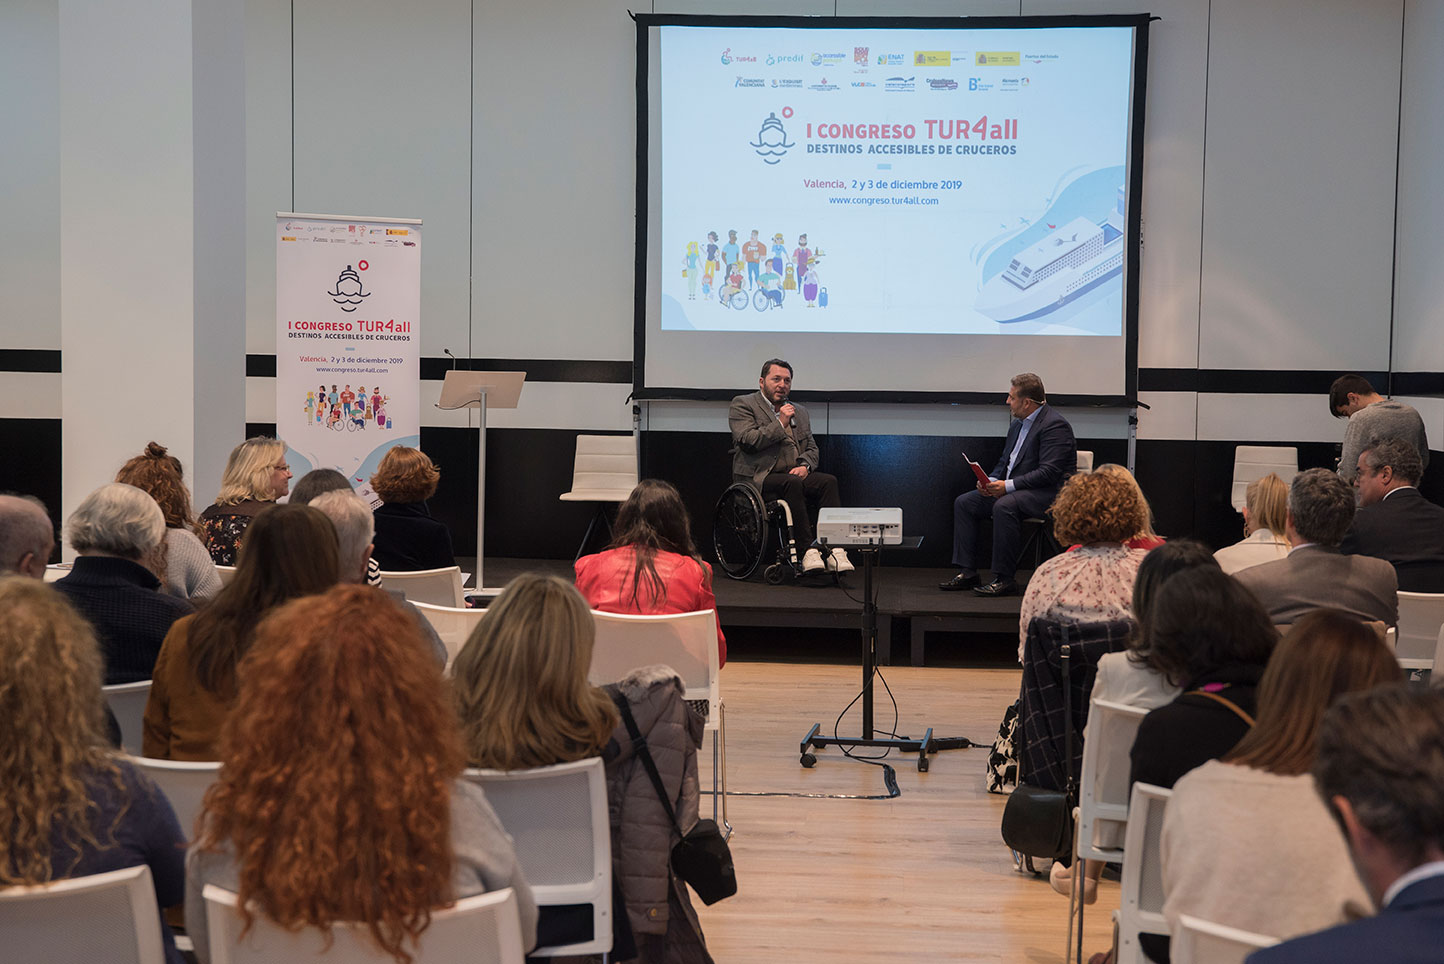 Fernando-Valmaseda-and-Francisco-Sardon-Presentation-Congress-Madrid-in-November